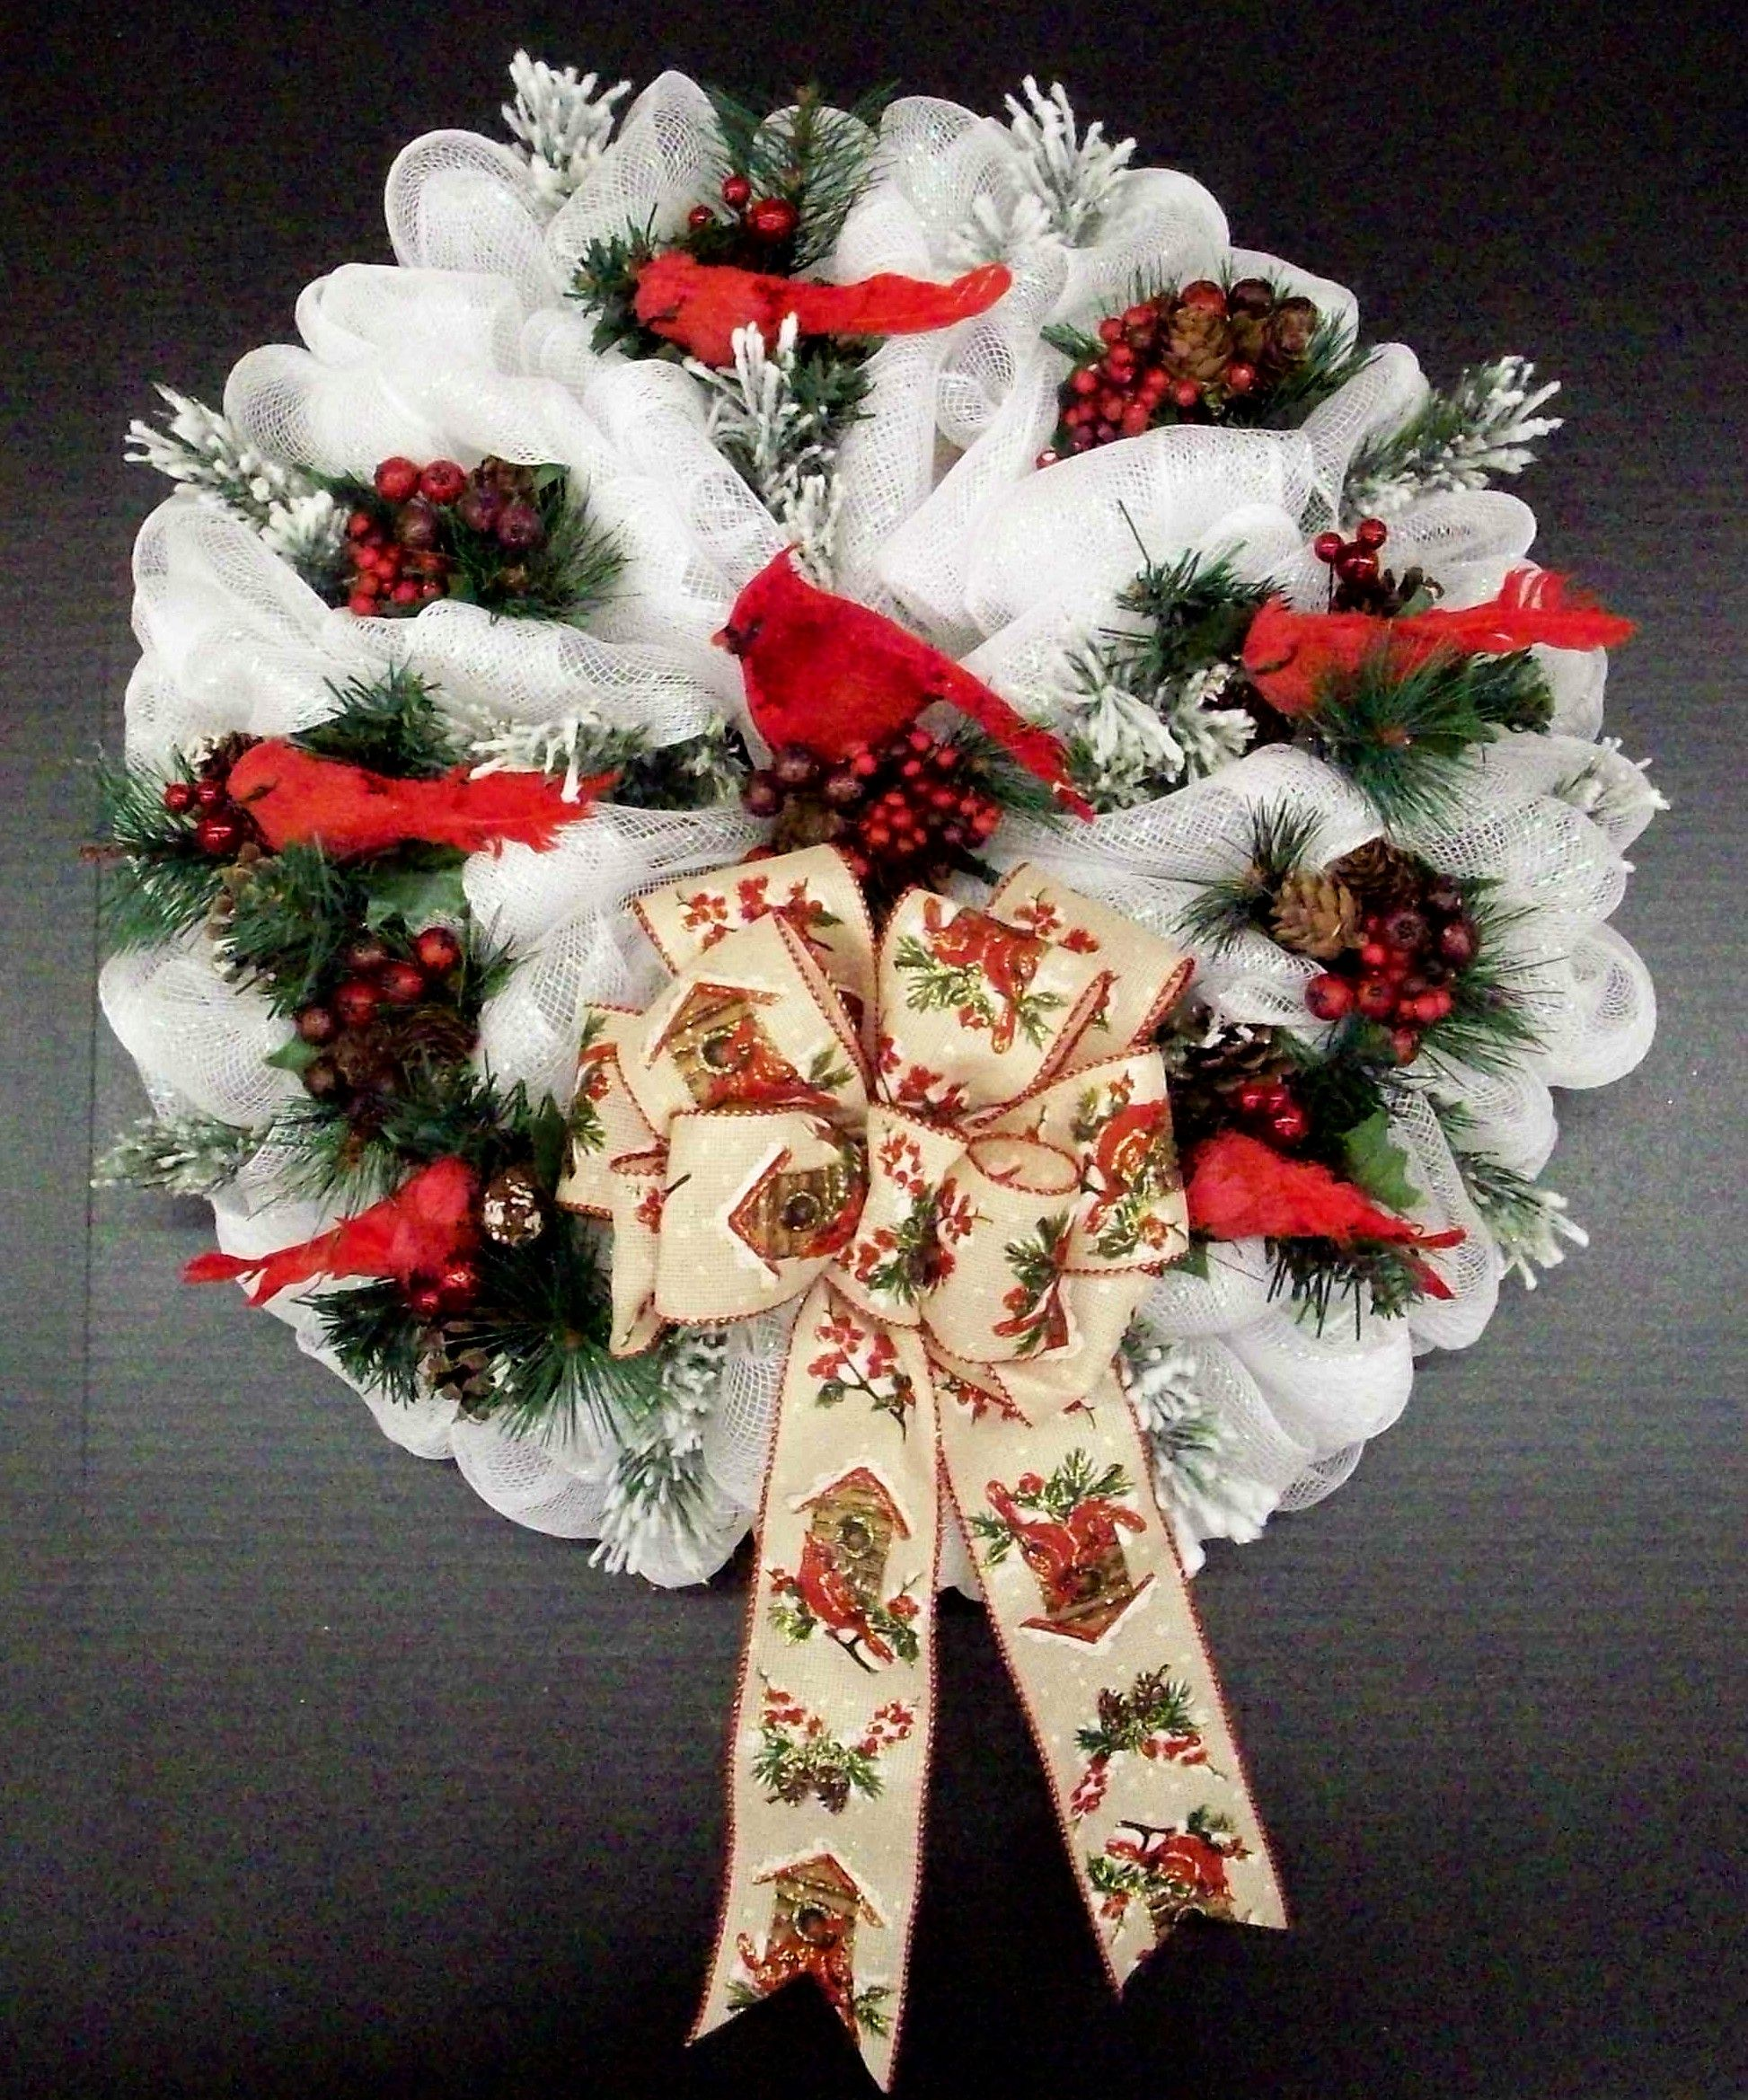 Cardinal Deco Mesh Wreath Designed By Karen B A C Moore Erie Pa Christmas Wreath De Deco Mesh Christmas Wreaths Christmas Mesh Wreaths Christmas Wreaths